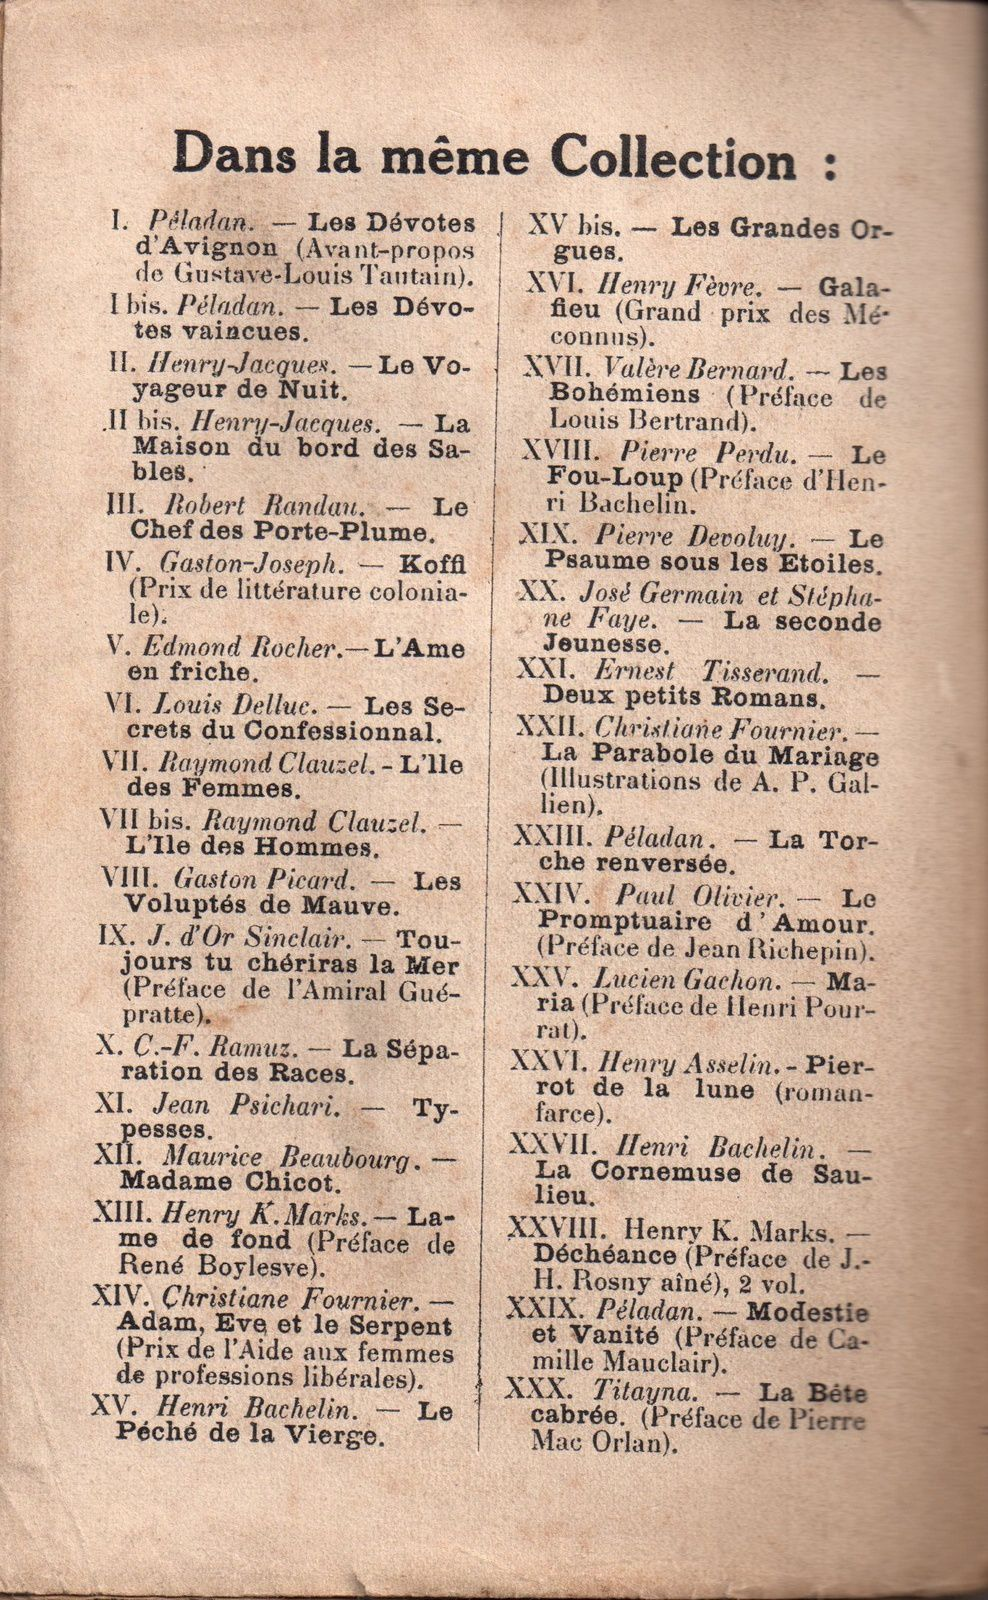 "Henry K. Marks ""Déchéance - Peter Middleton"" (Éditions du Monde - 1925)"